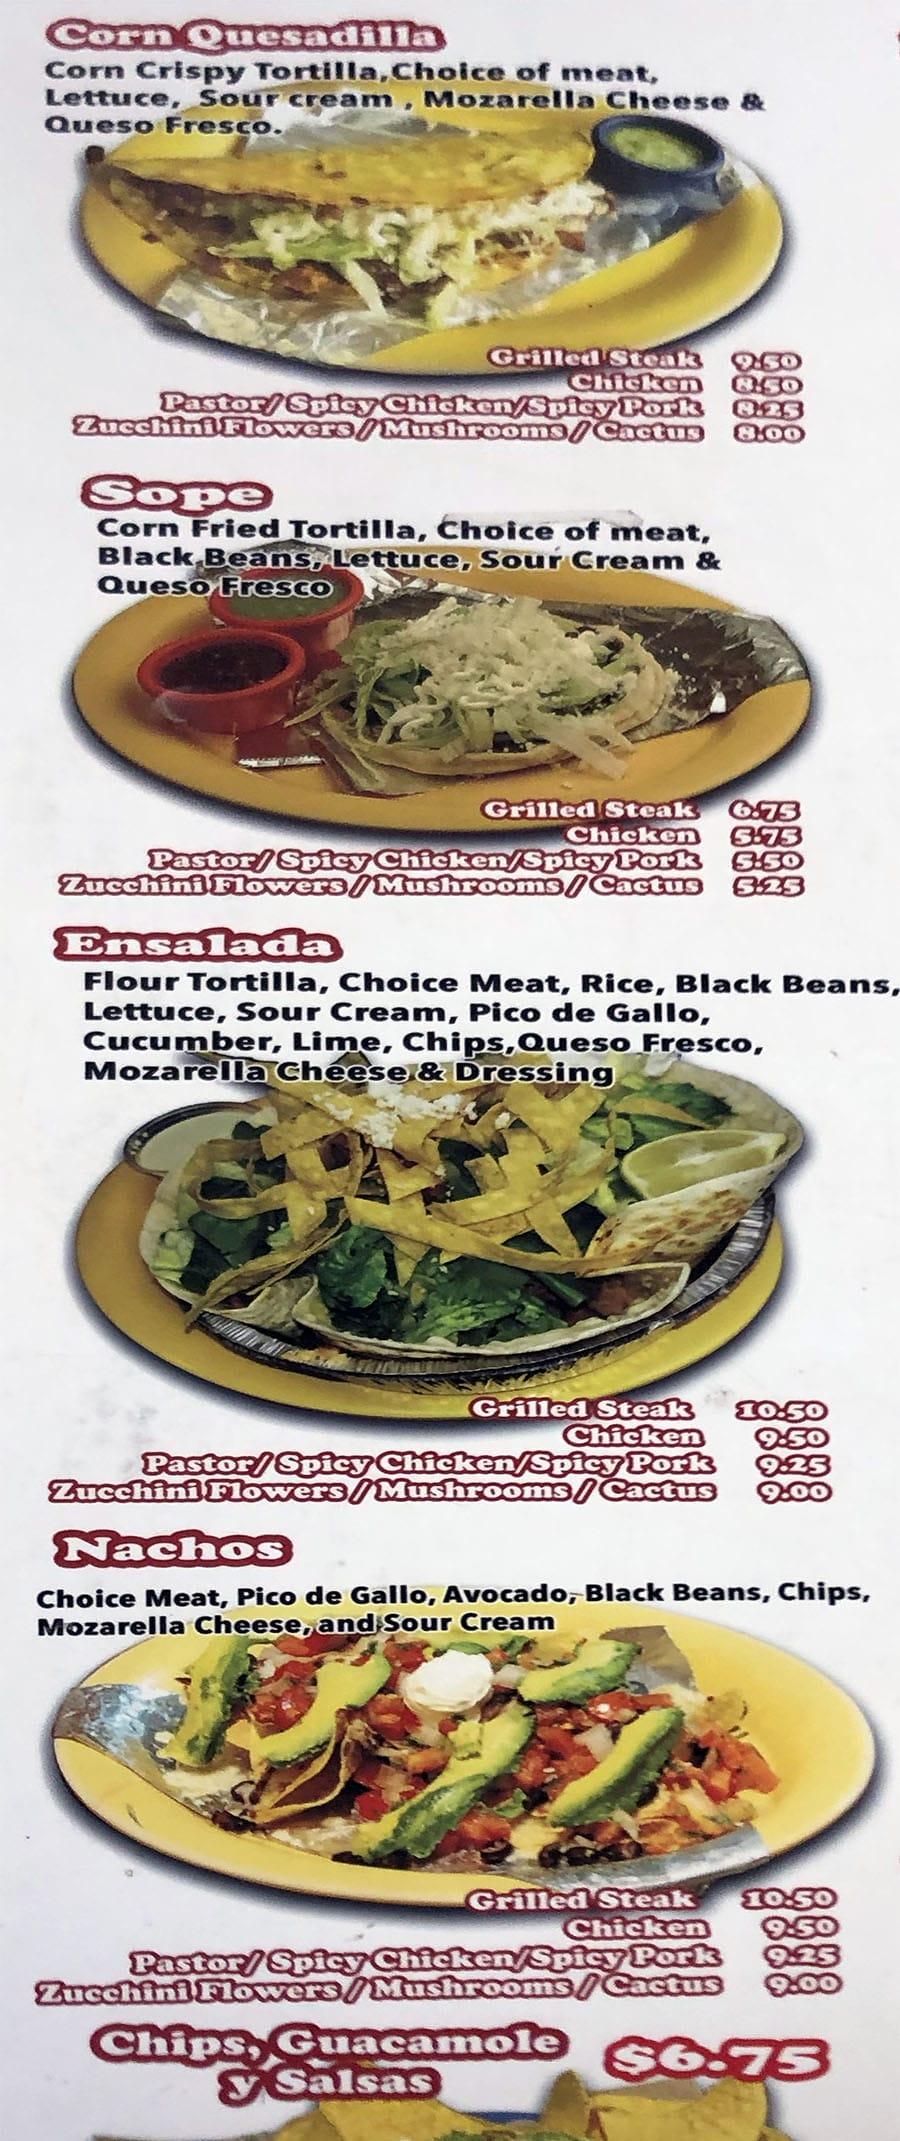 Chunga's menu - quesadilla, sope, ensalada, nachos, guacamole